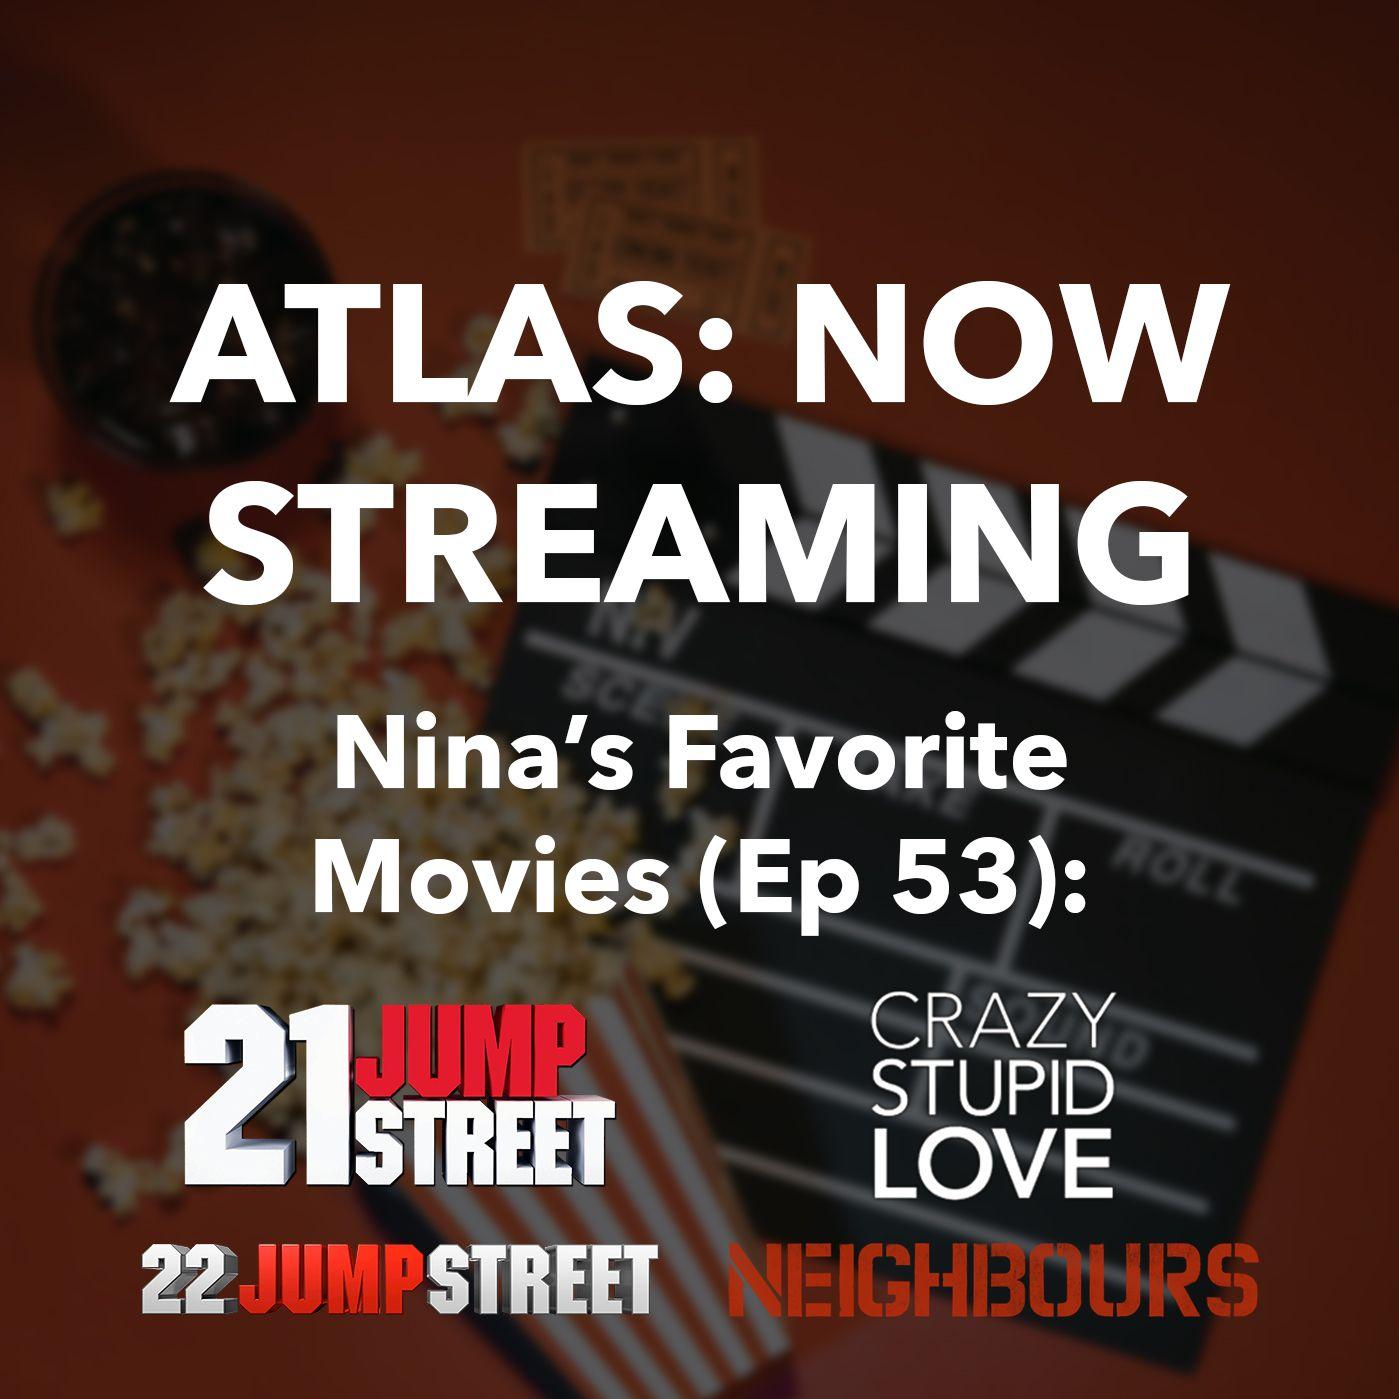 Nina's Favorite Movies - Atlas: Now Streaming Episode 53